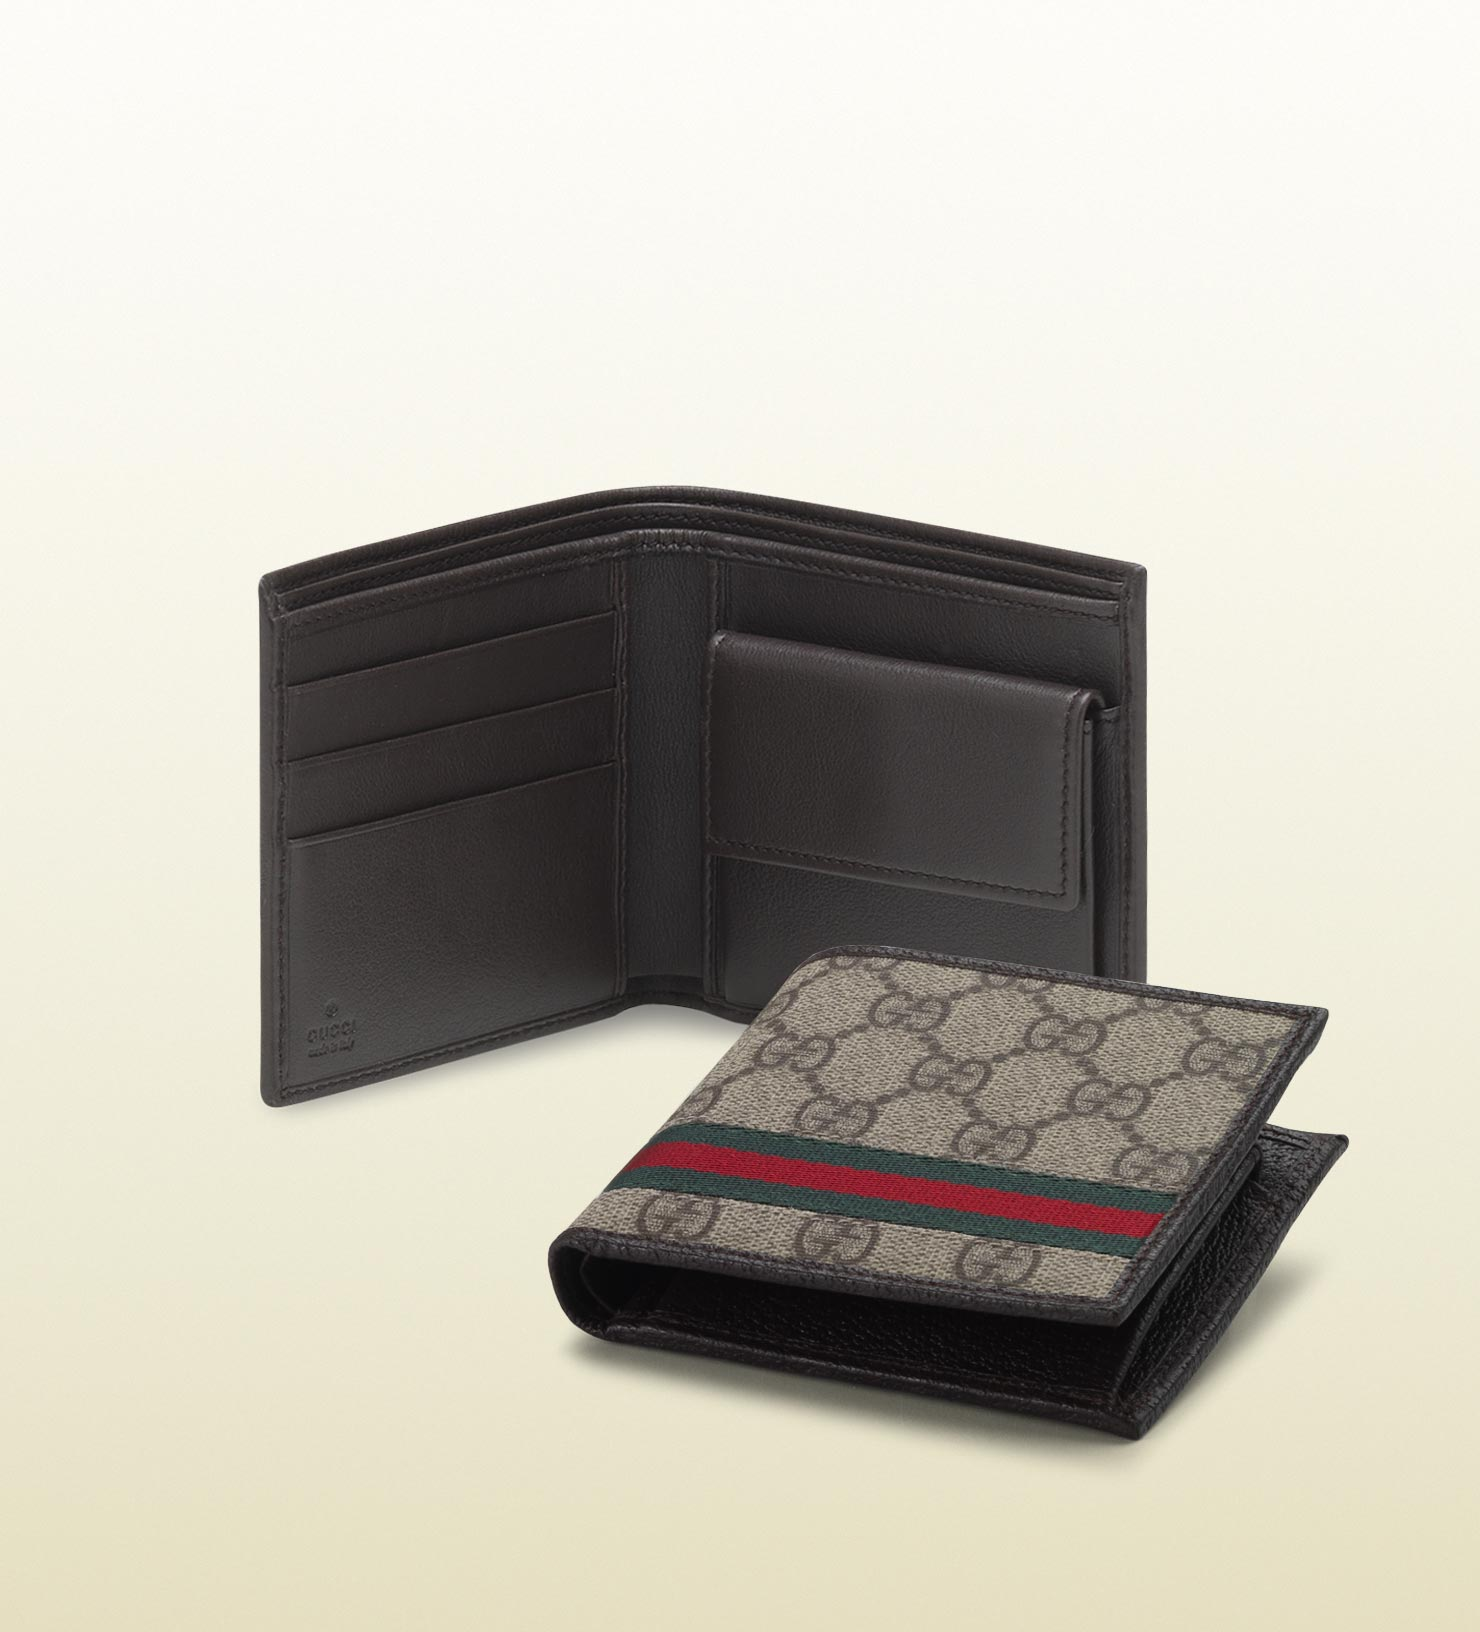 gucci web coin wallet